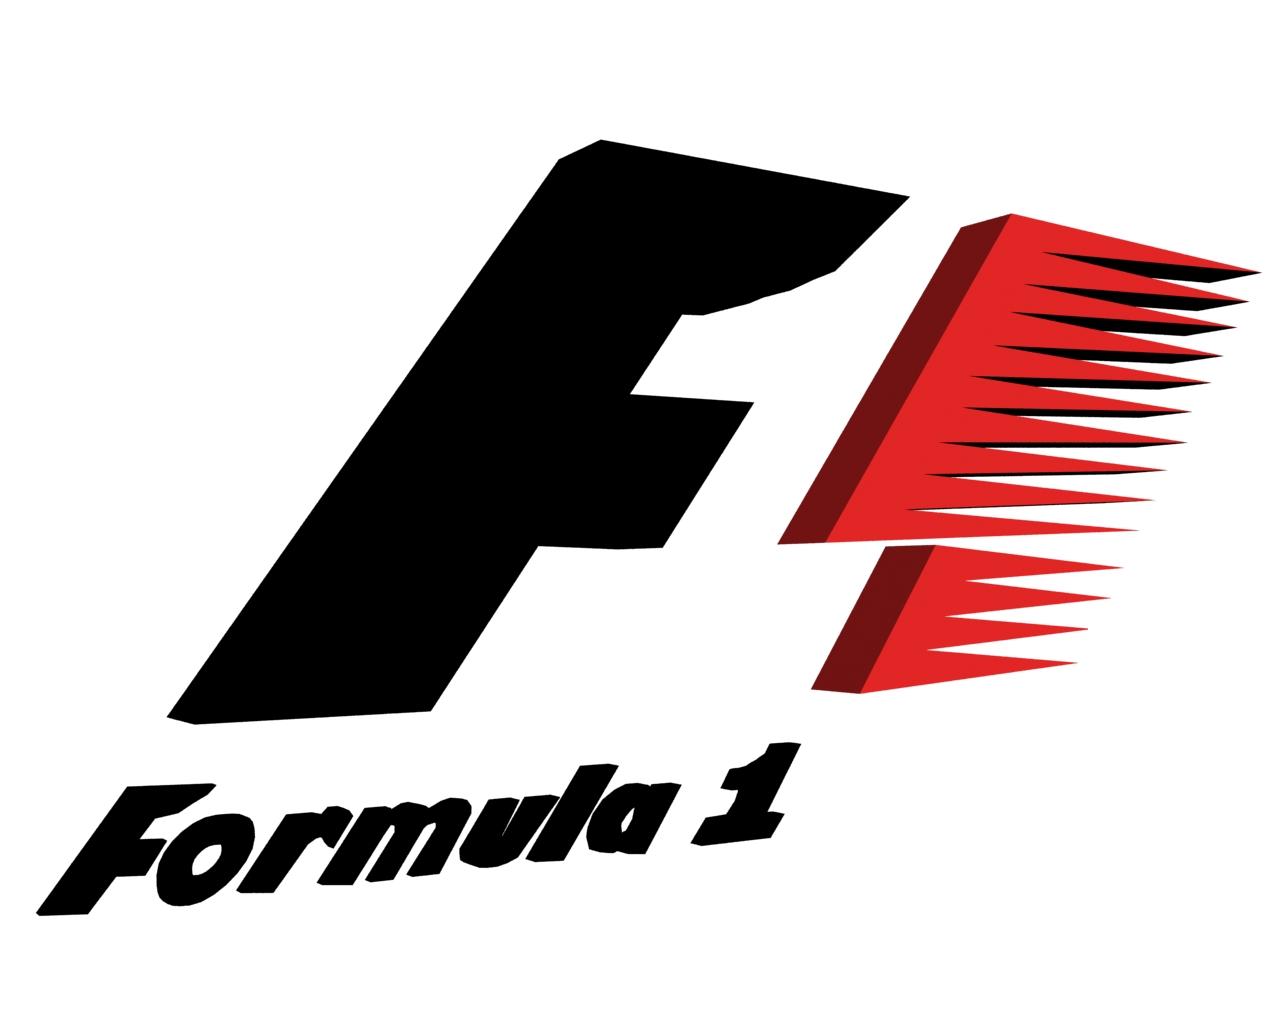 Resultado de imagen para logo formula 1 2016